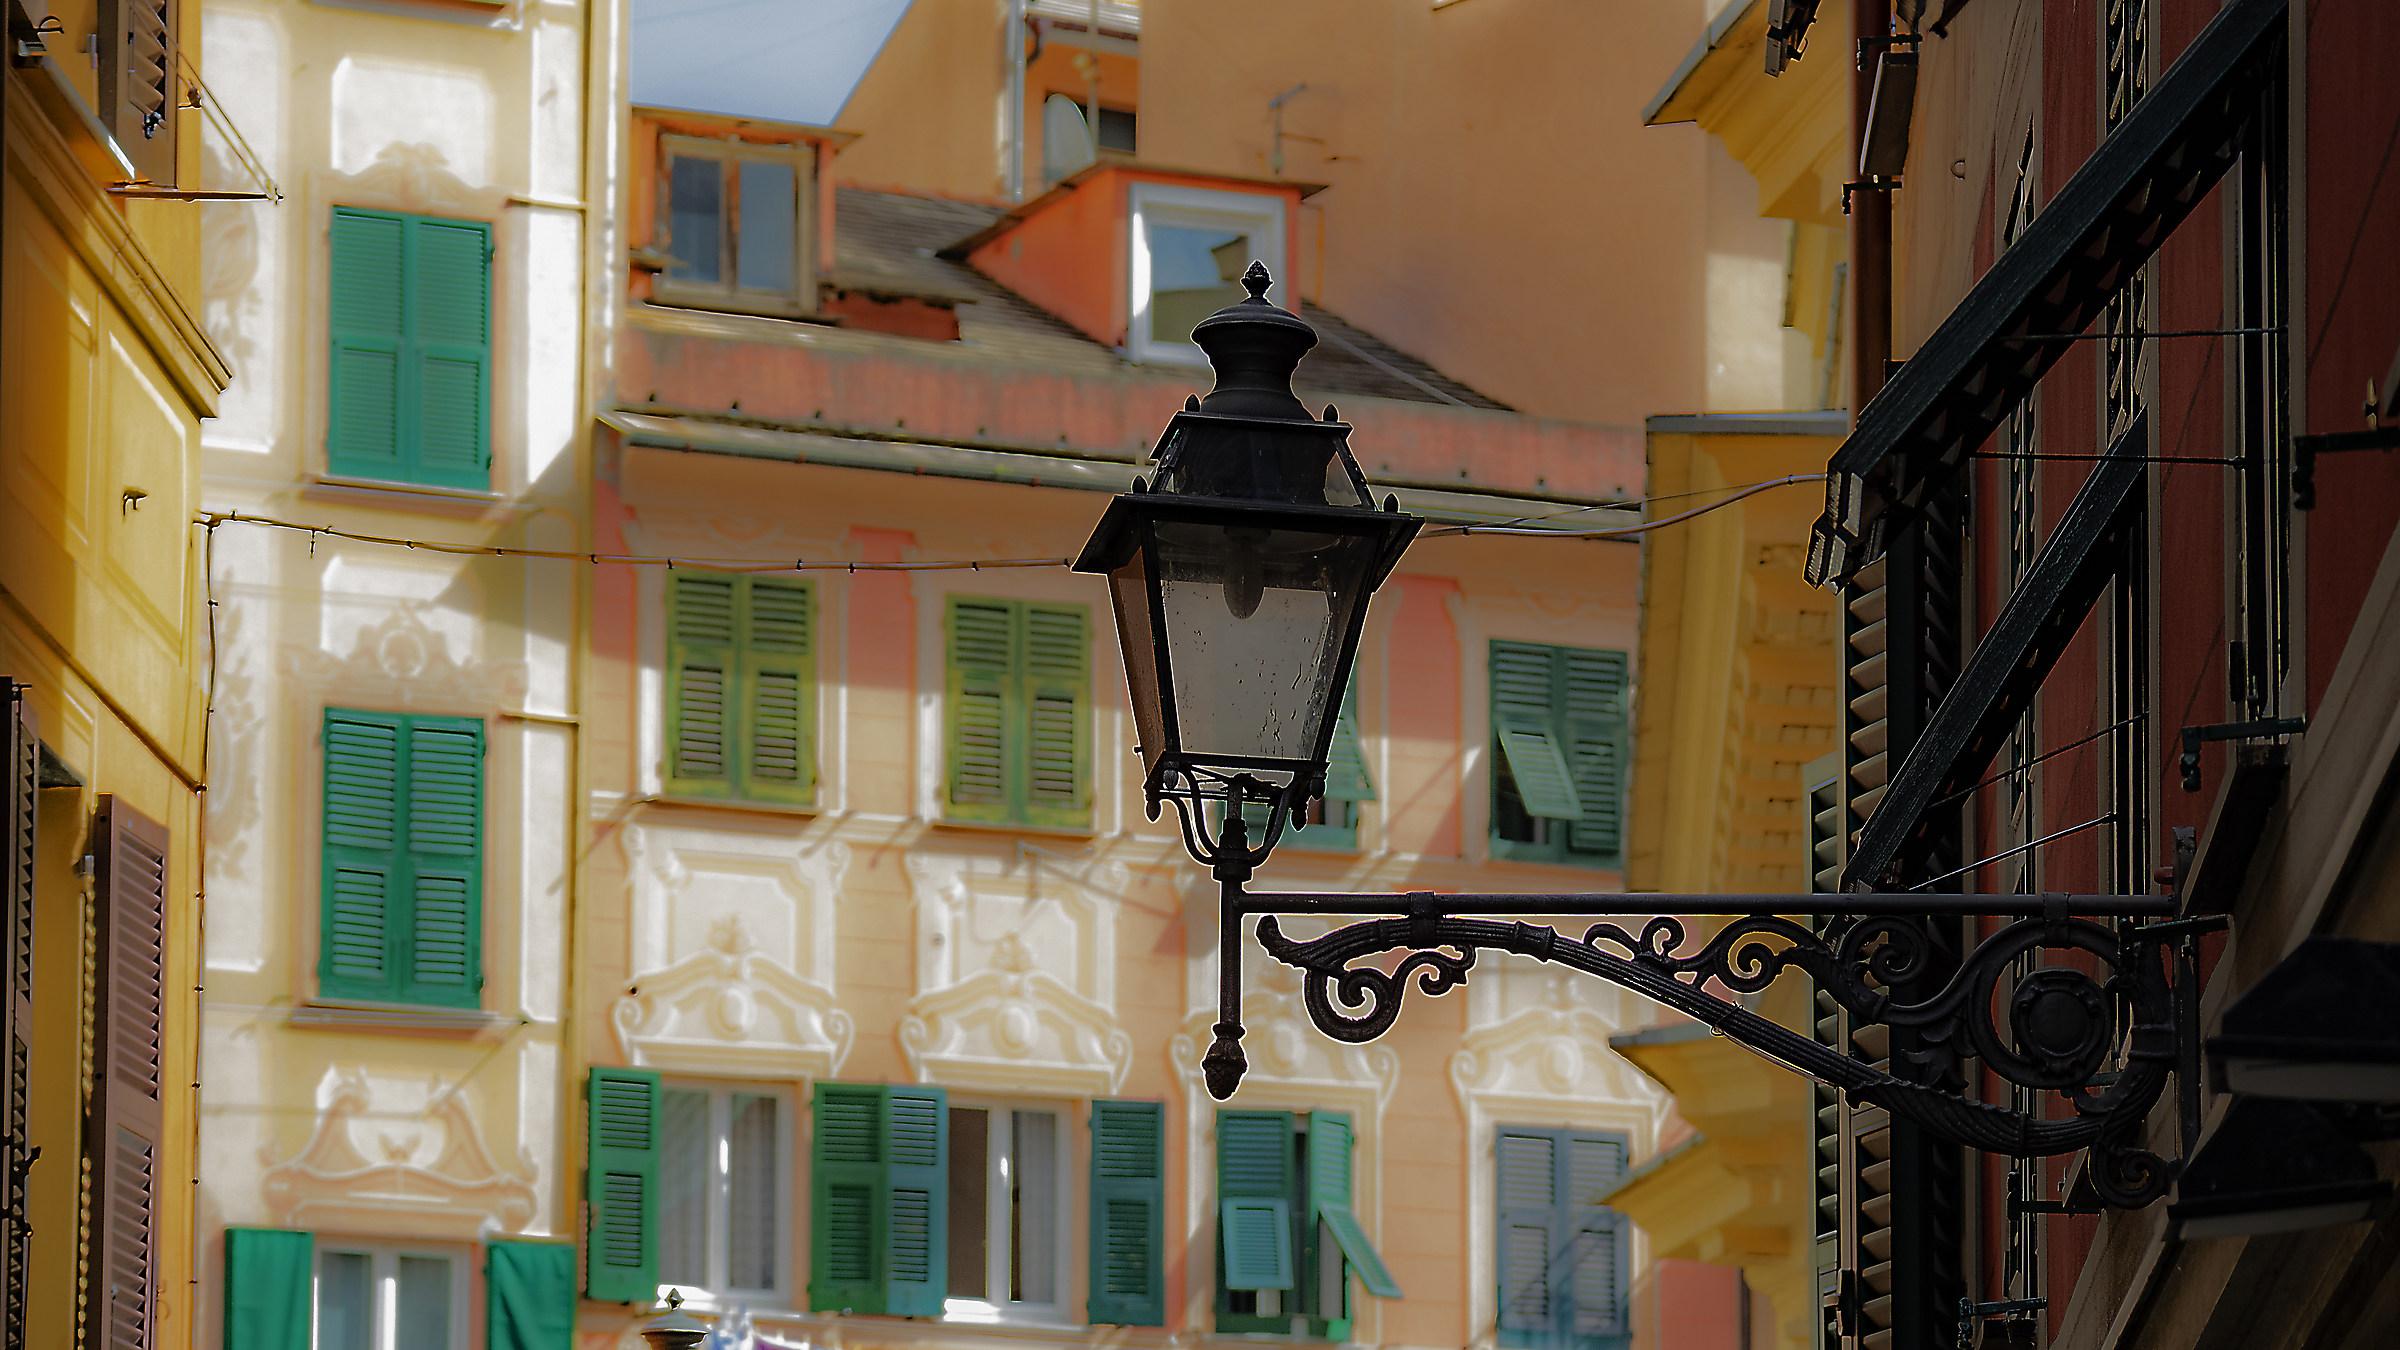 The lamppost of Santa...